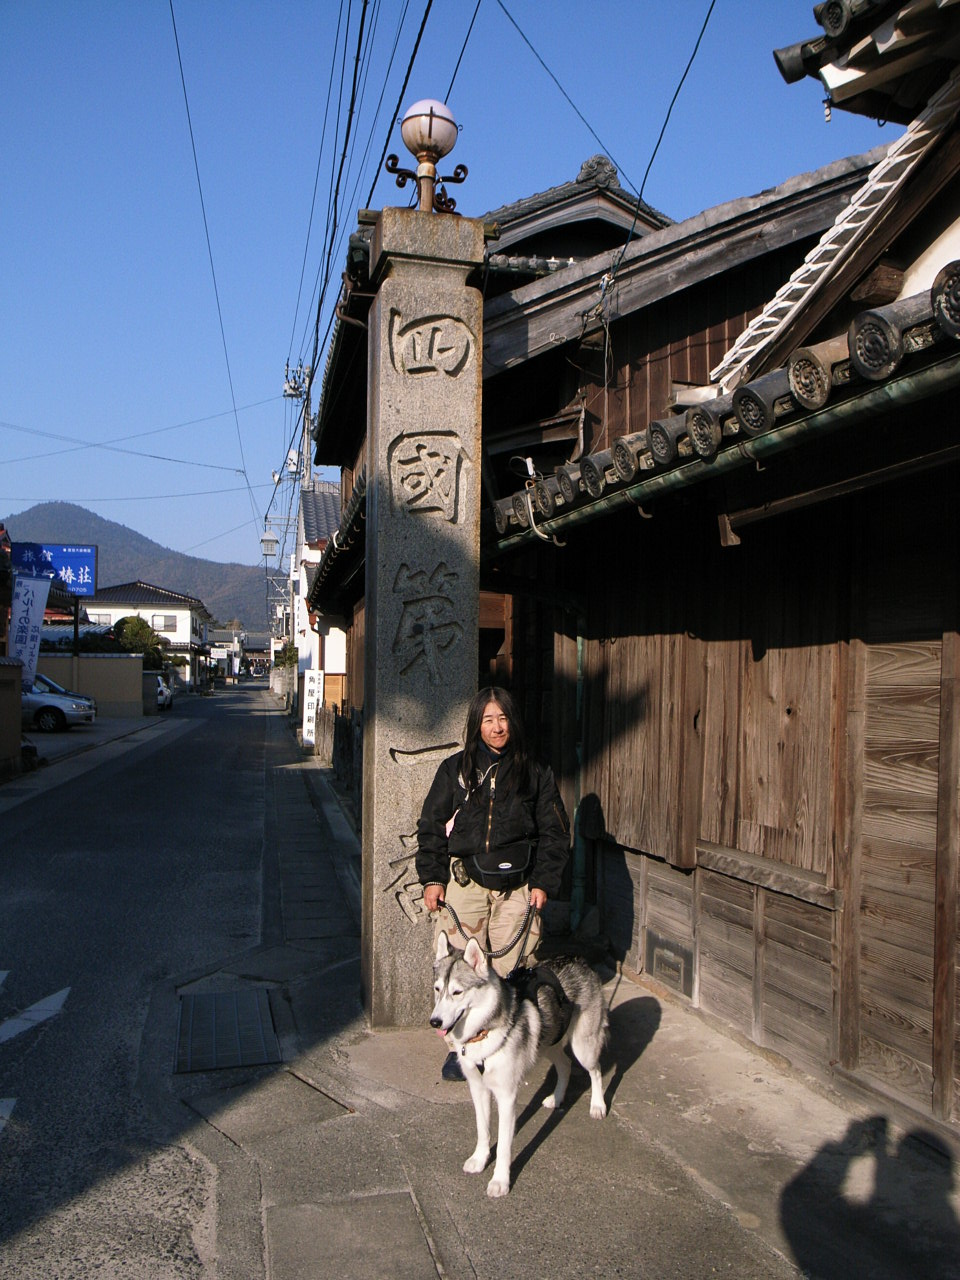 Shikoku Pilgrimage with Hana2  Dec.25th 2005_c0049299_1421563.jpg